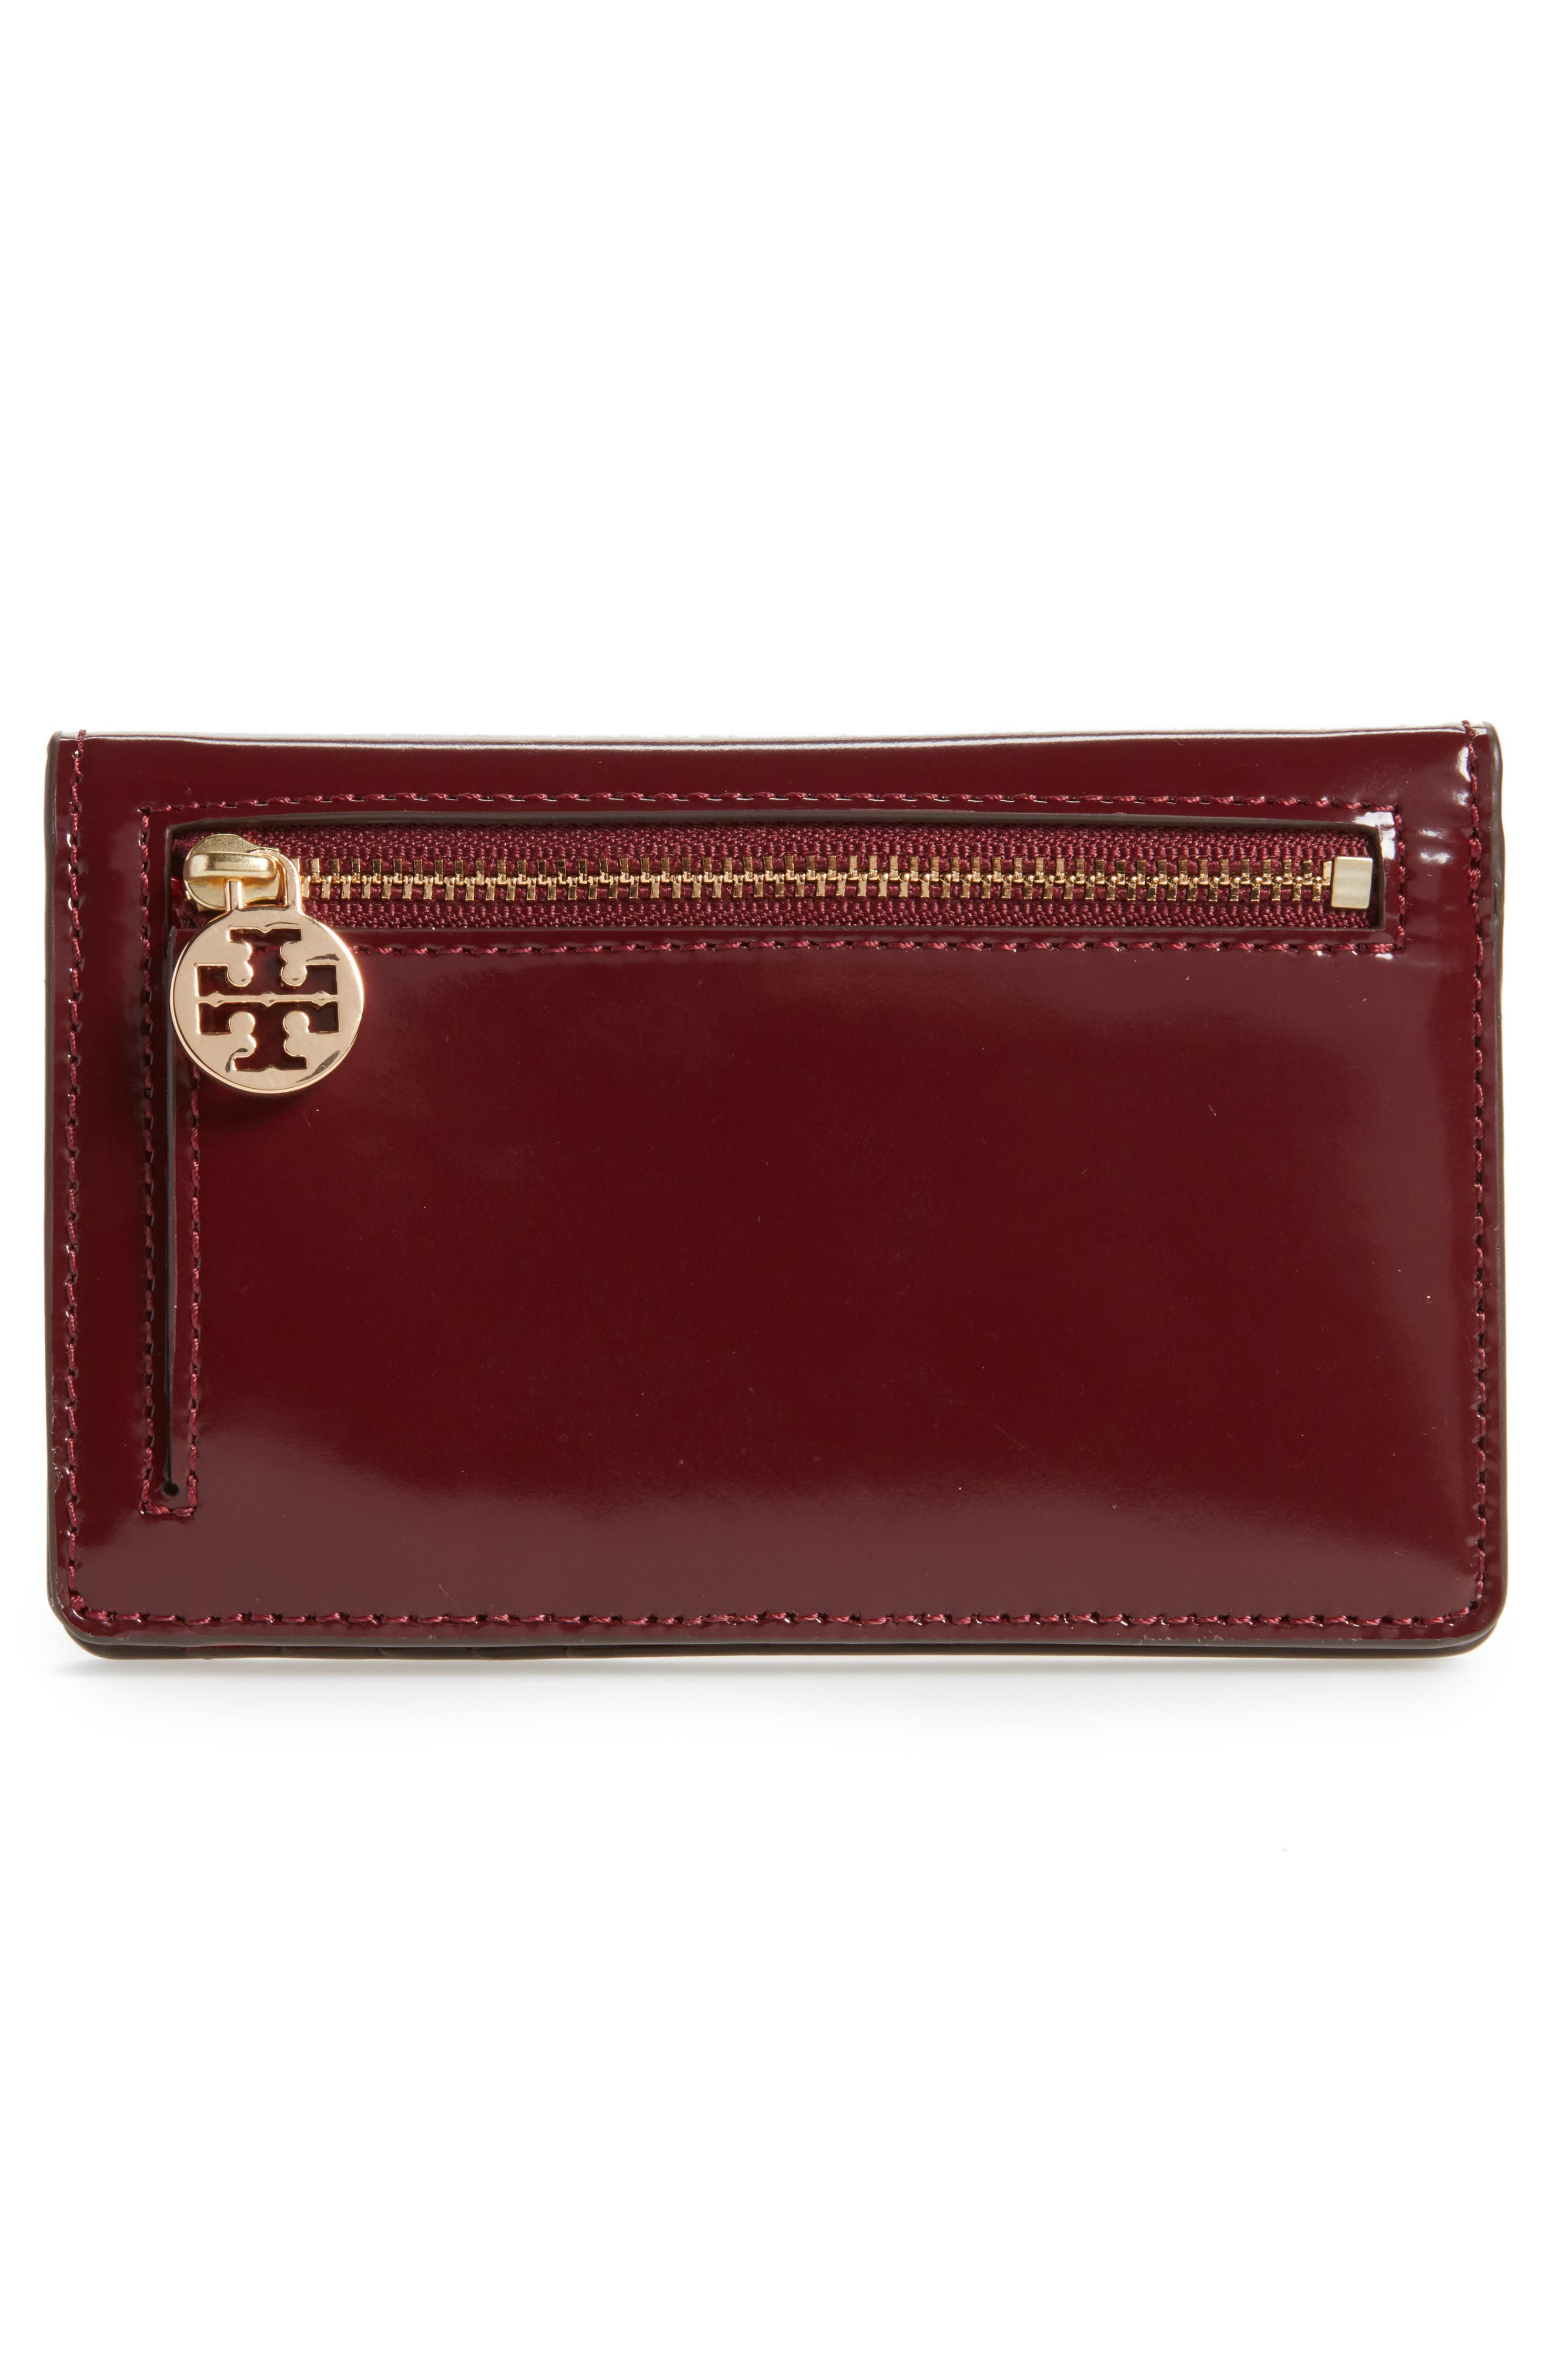 Medium McGraw Dachshund Slim Leather Wallet,                             Alternate thumbnail 4, color,                             600